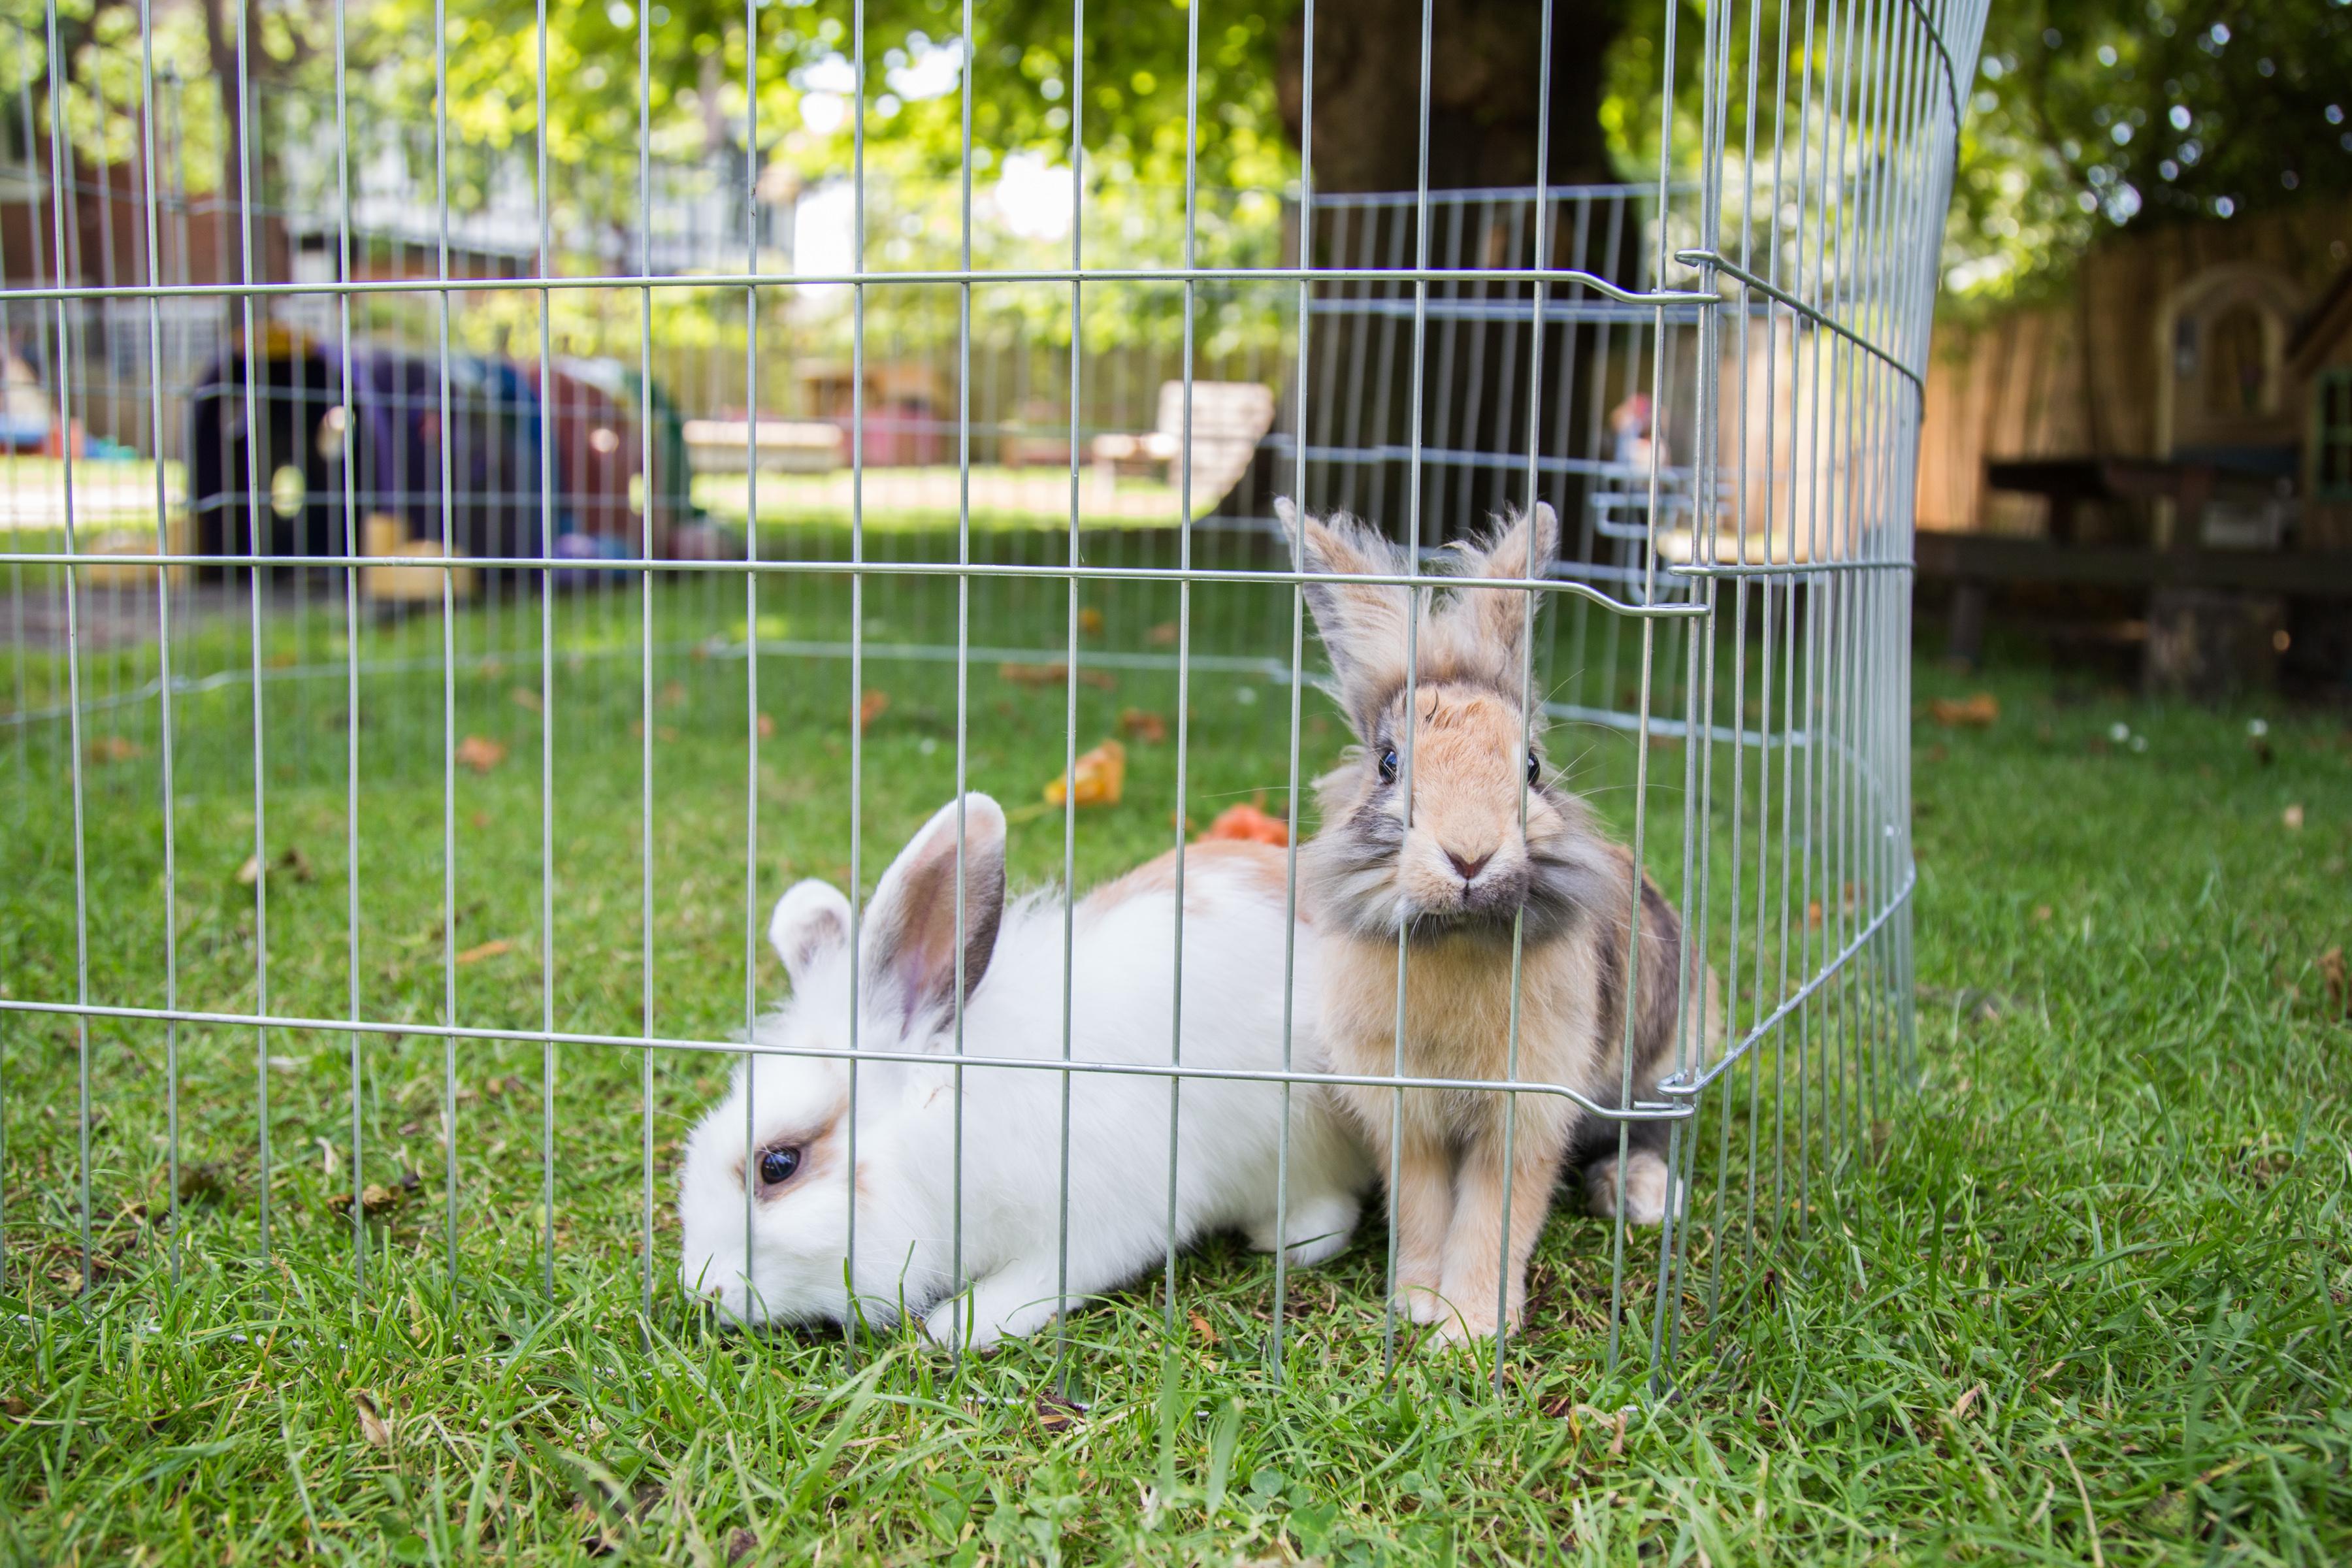 Diddy Dinos Rabbits